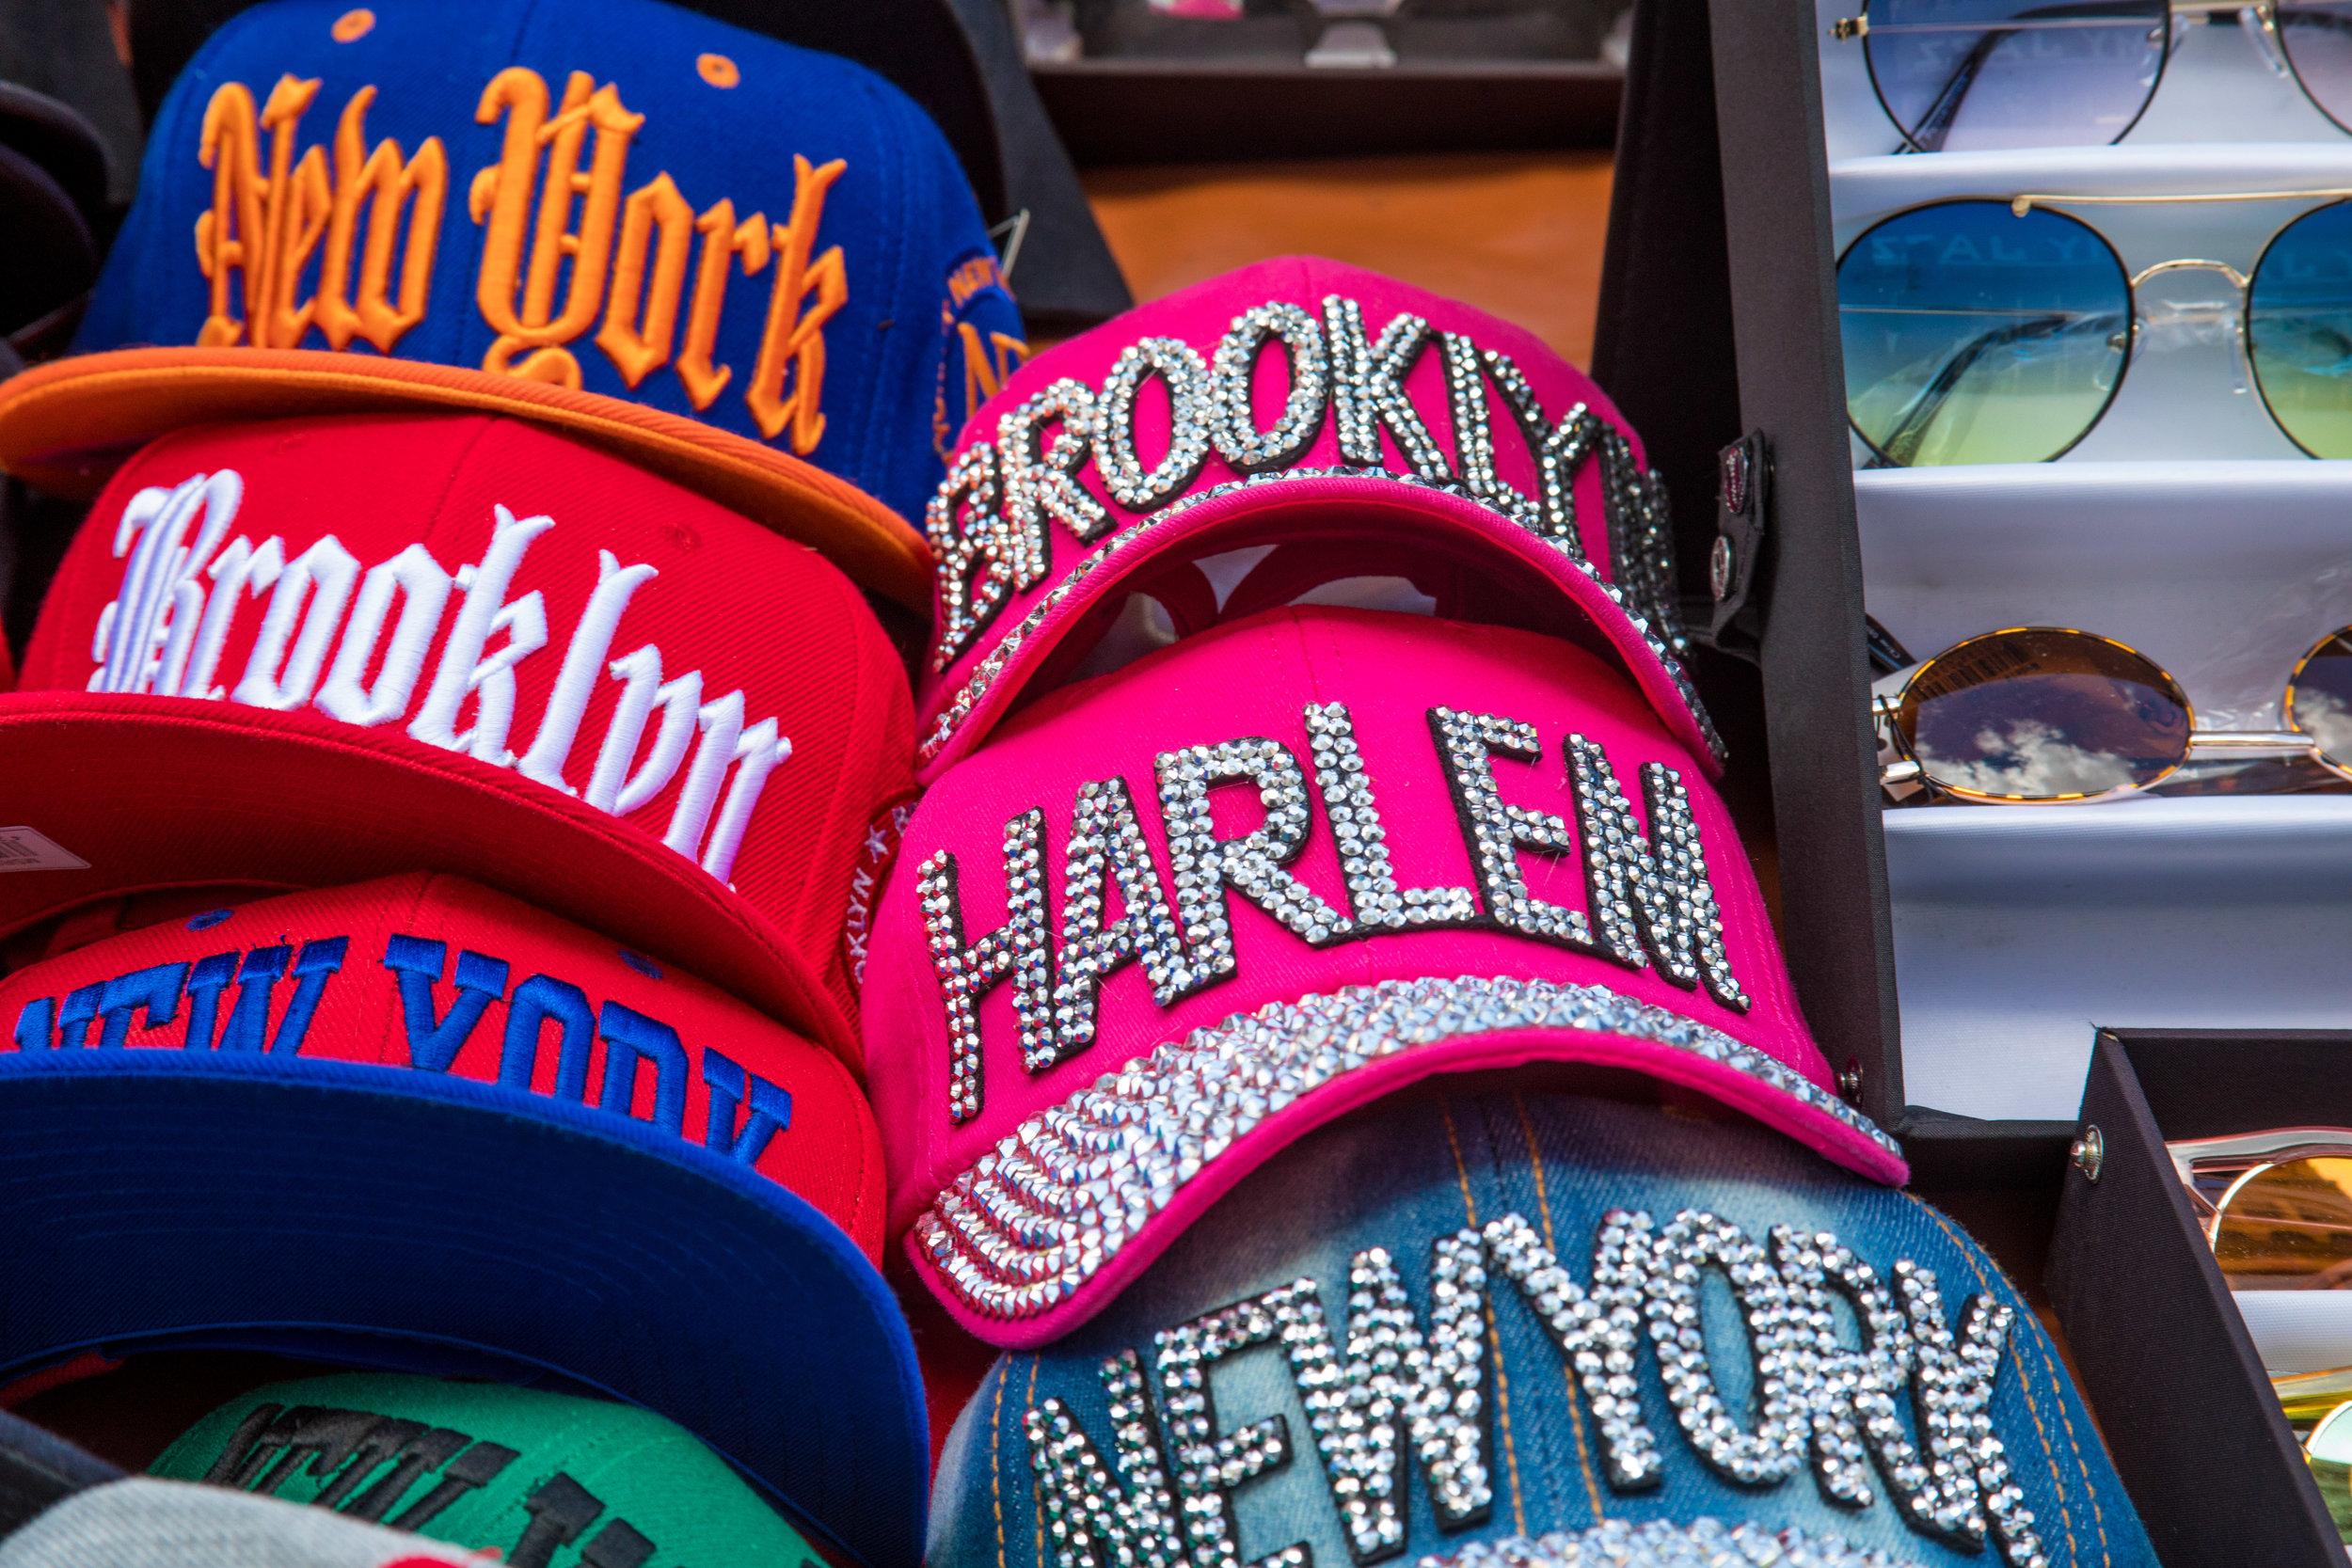 LSNY_Harlem-1.jpg